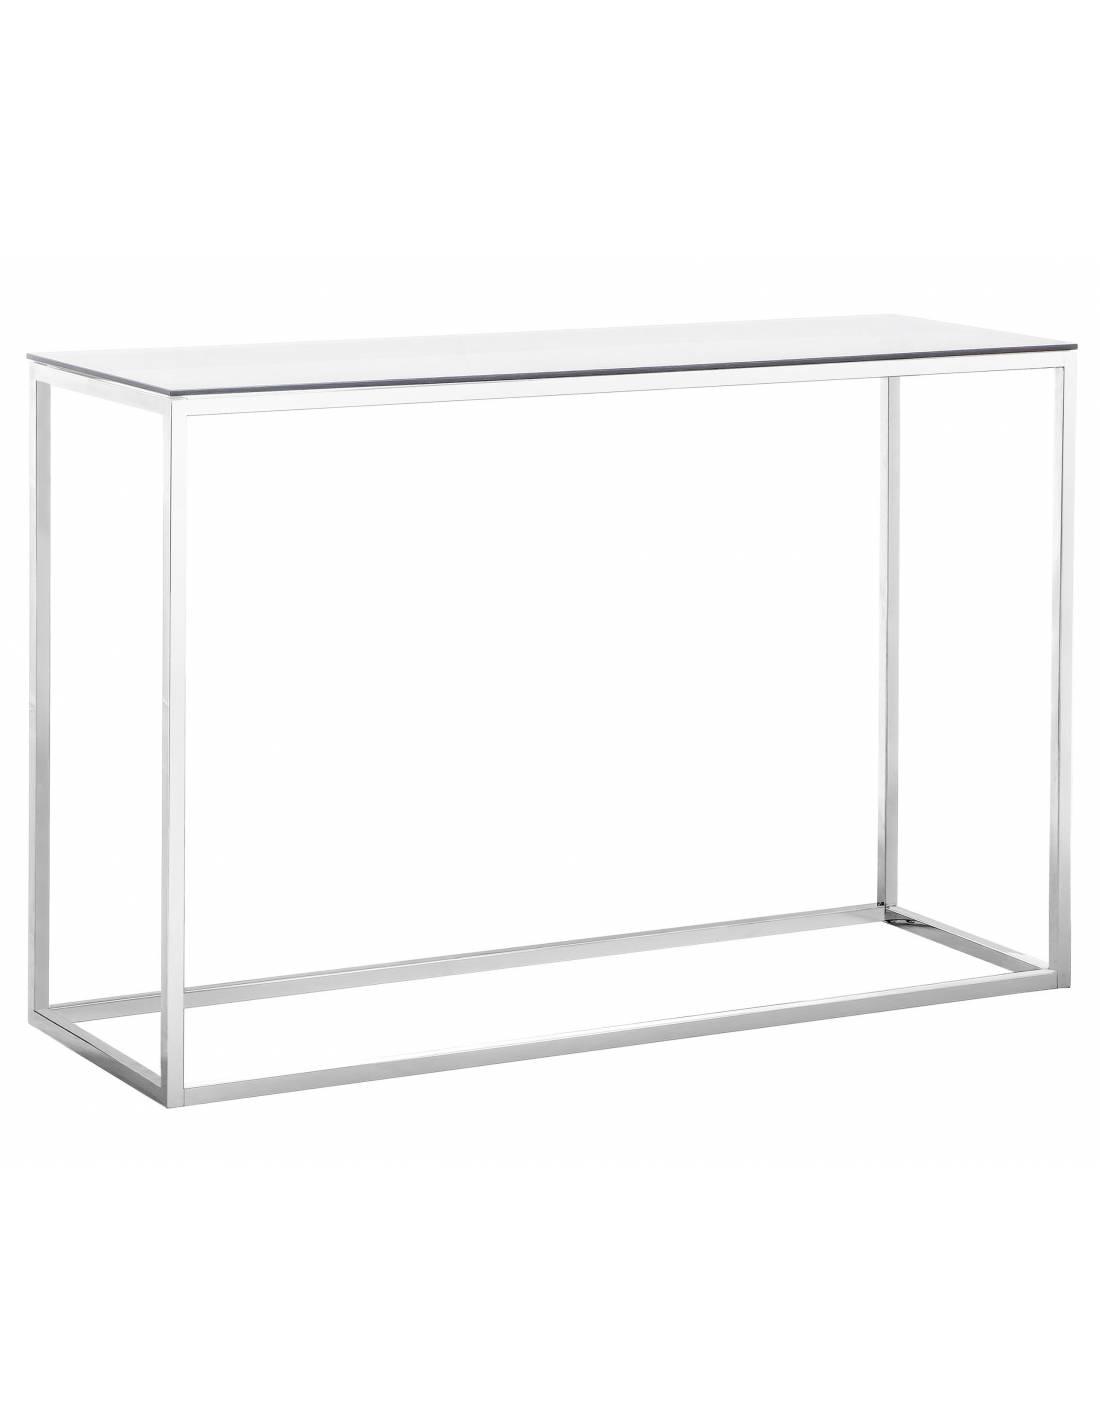 Metalowa srebrna konsola ze szklanym blatem